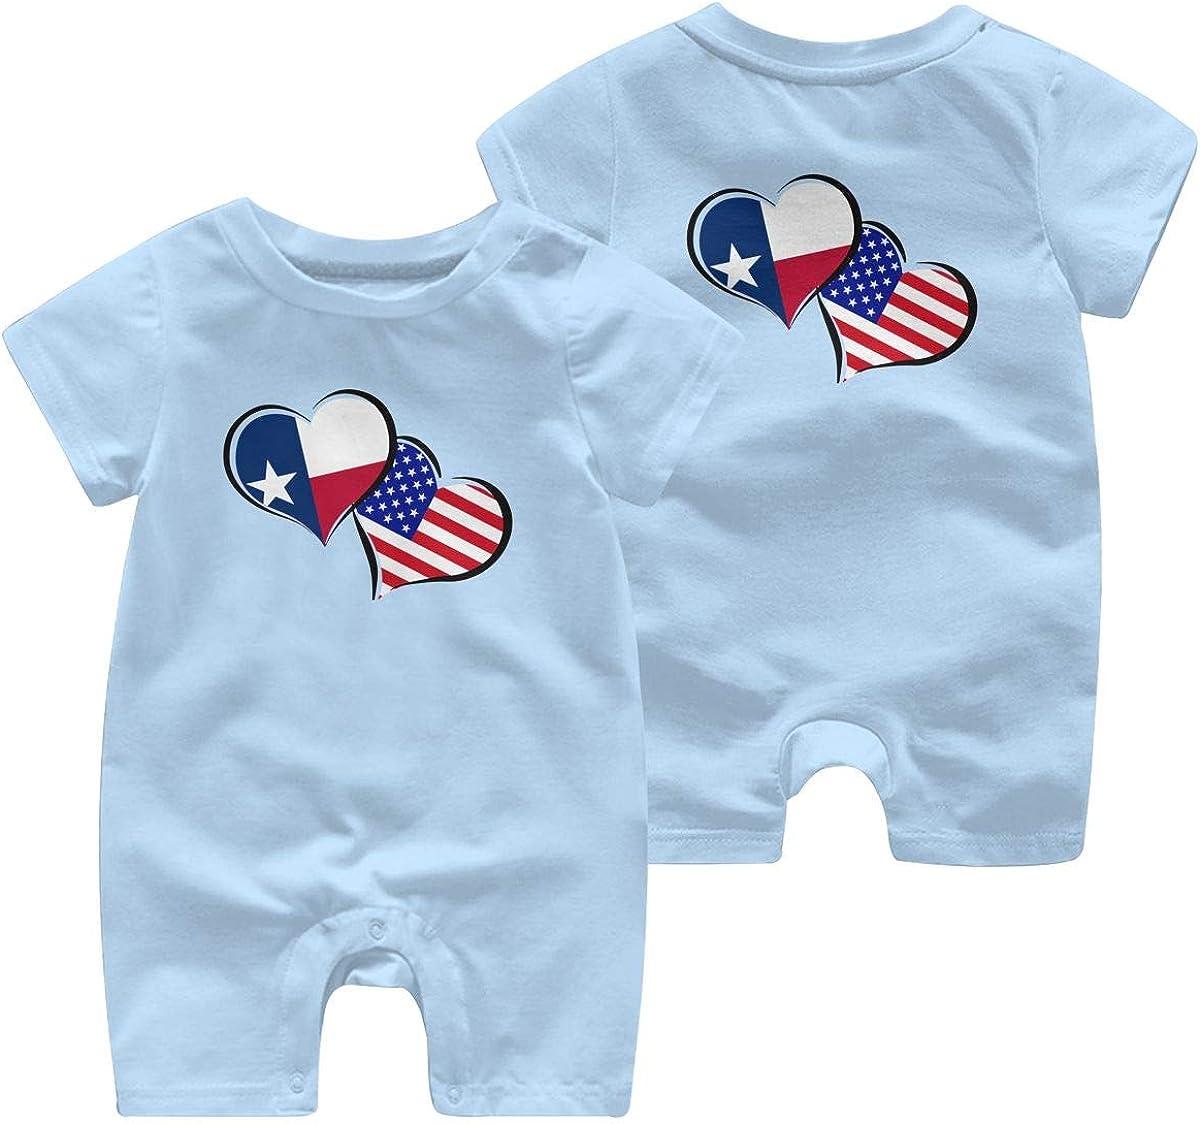 Baby Girls Bodysuits Texas American Flag Hearts Love Infant Short Sleeve Romper Jumpsuit